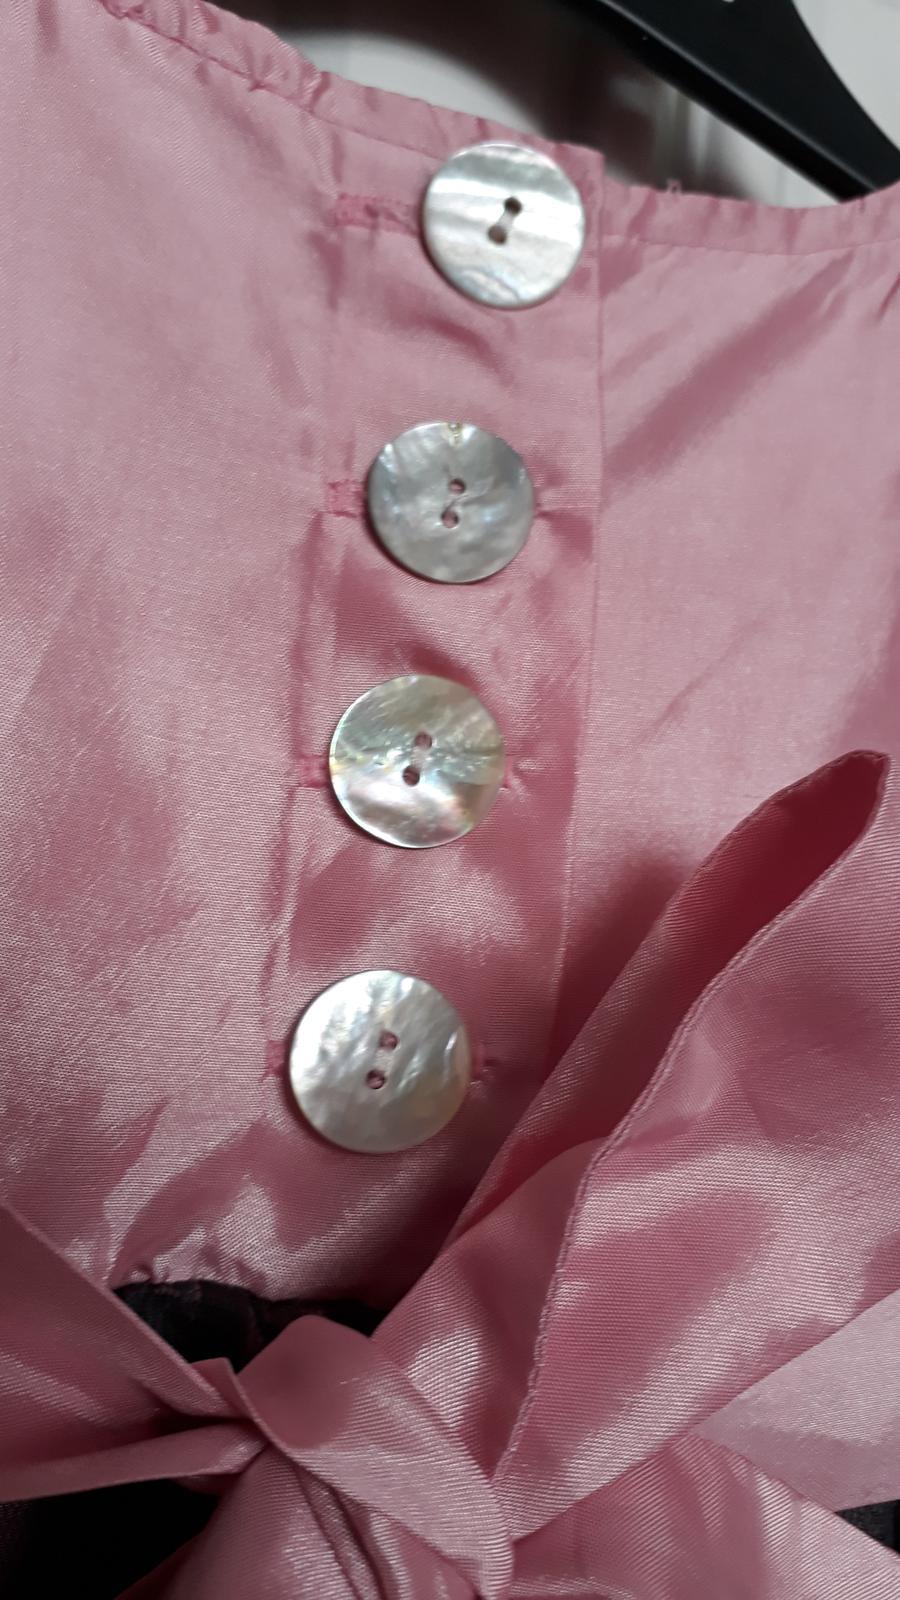 Luxusné šaty s krajkou - Obrázok č. 3